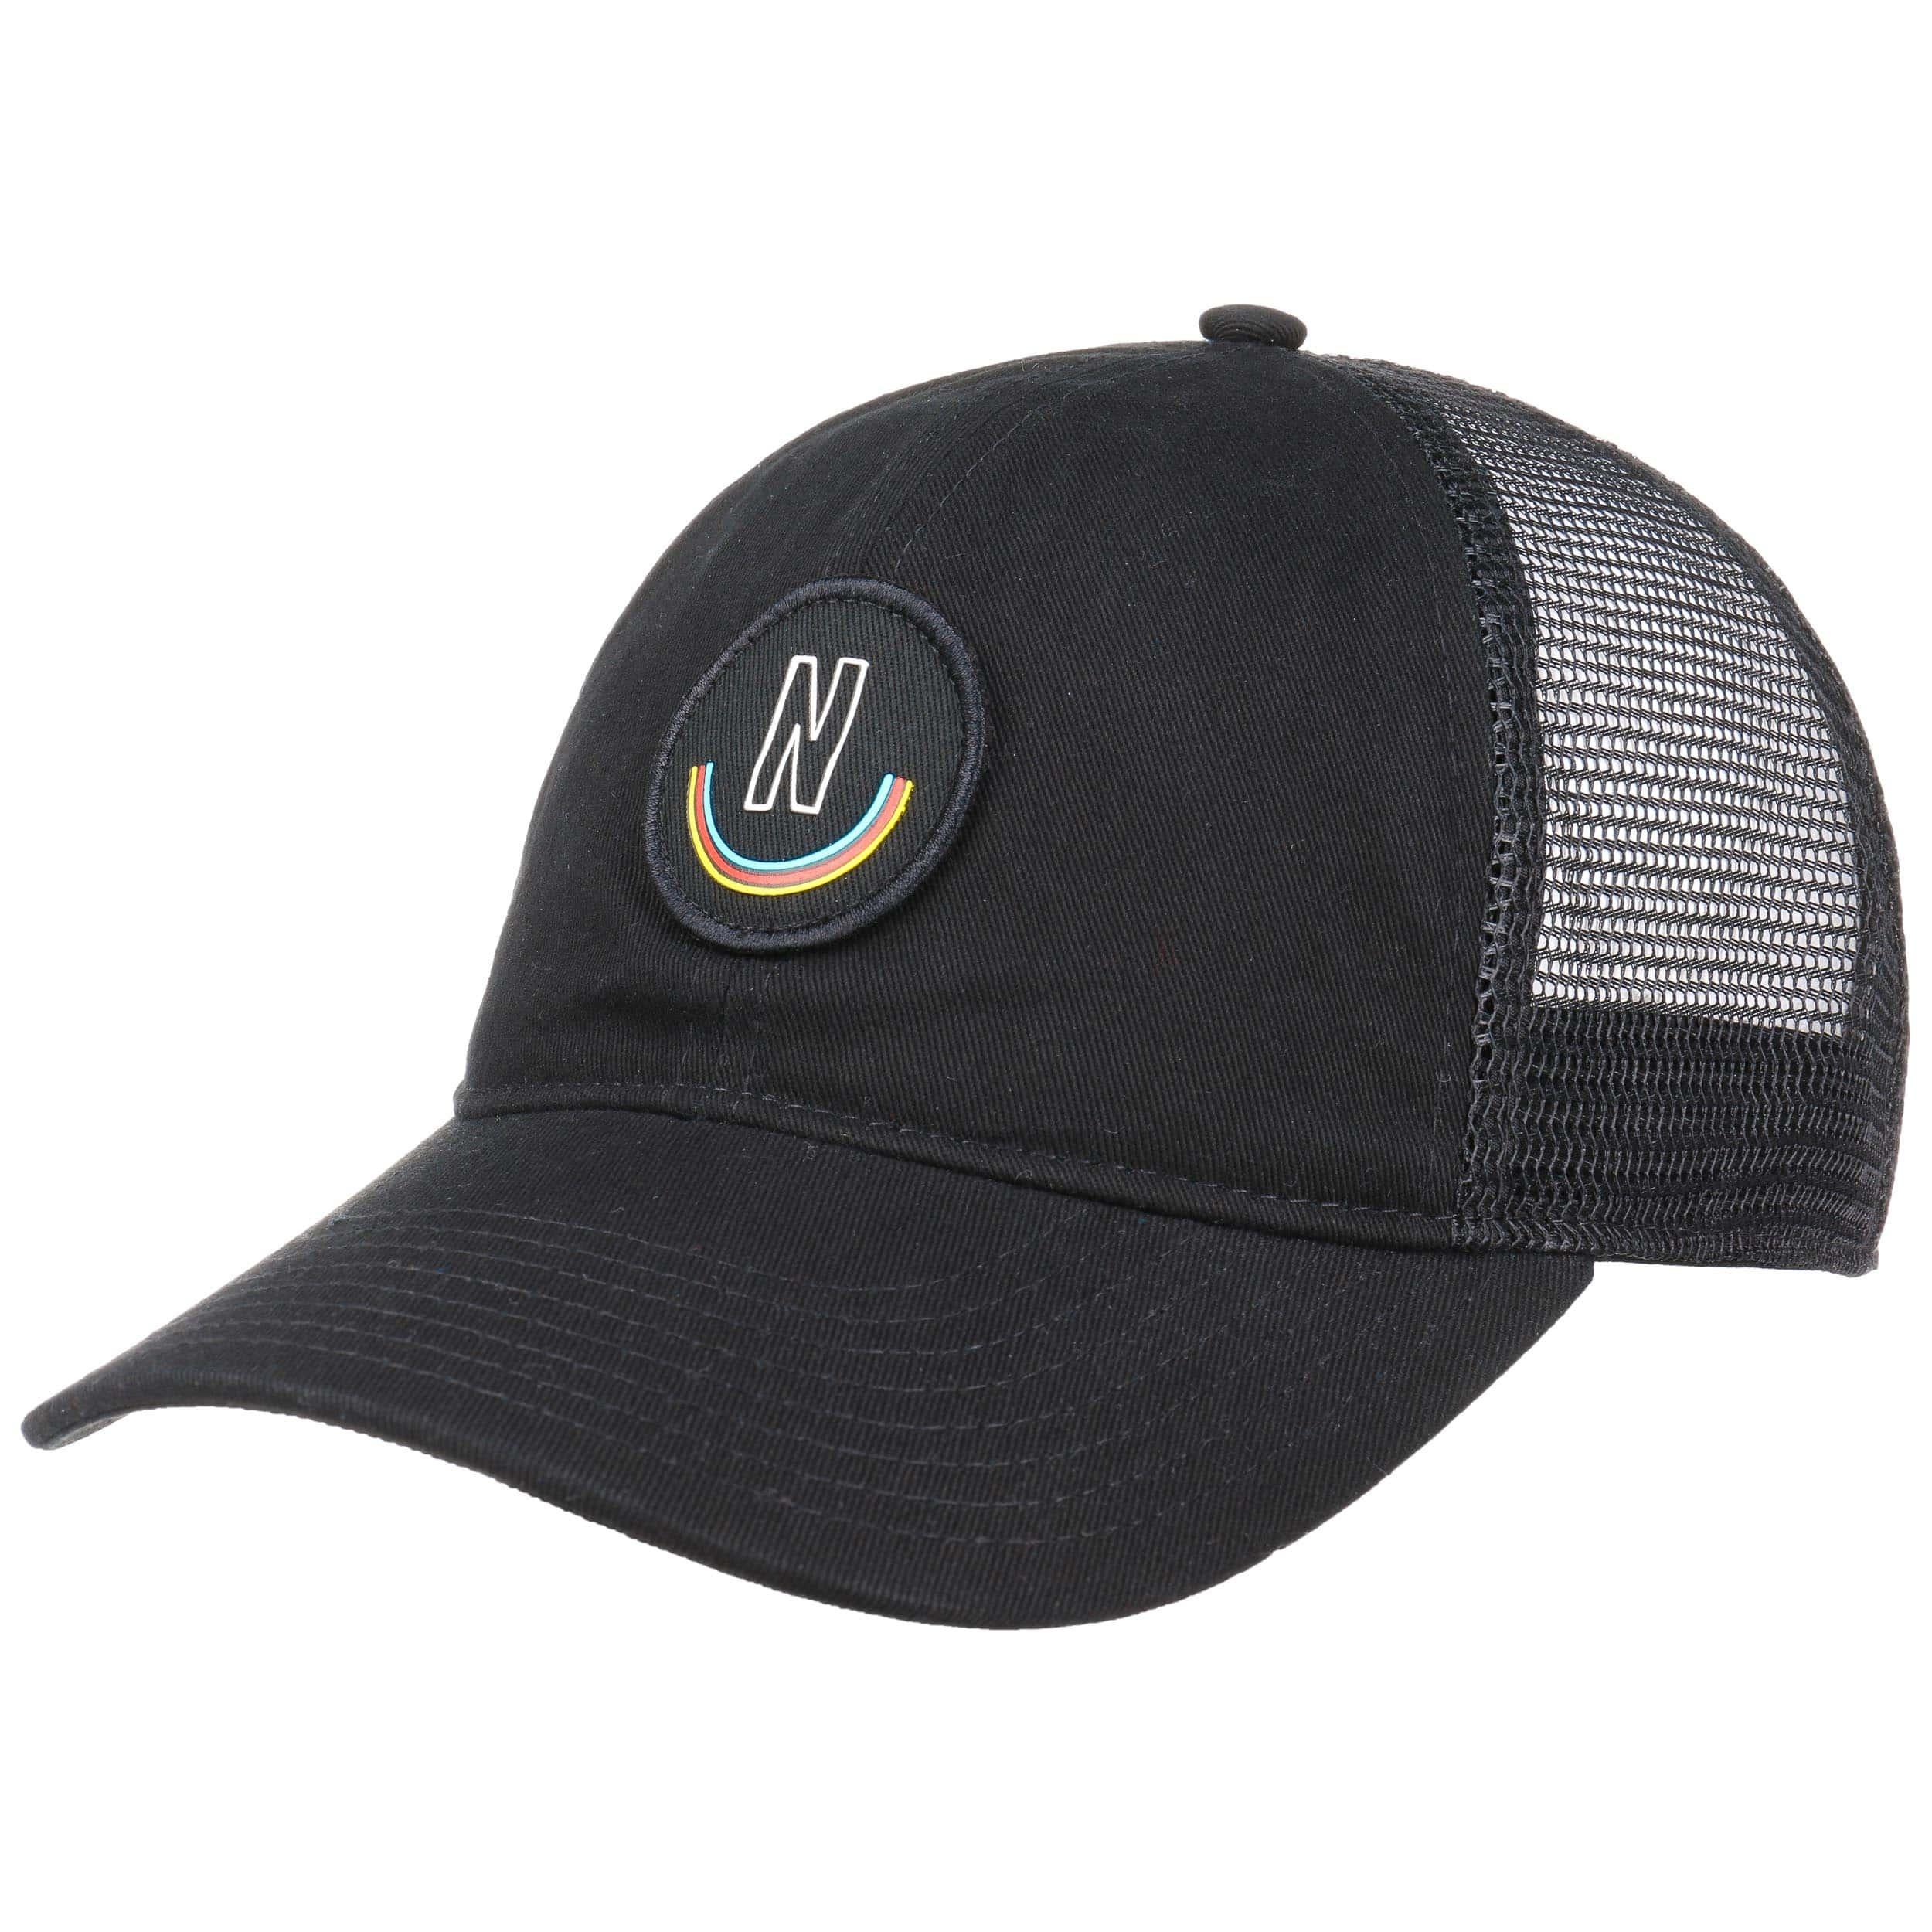 circle patch trucker cap by neff eur 19 95 hats caps beanies shop online. Black Bedroom Furniture Sets. Home Design Ideas